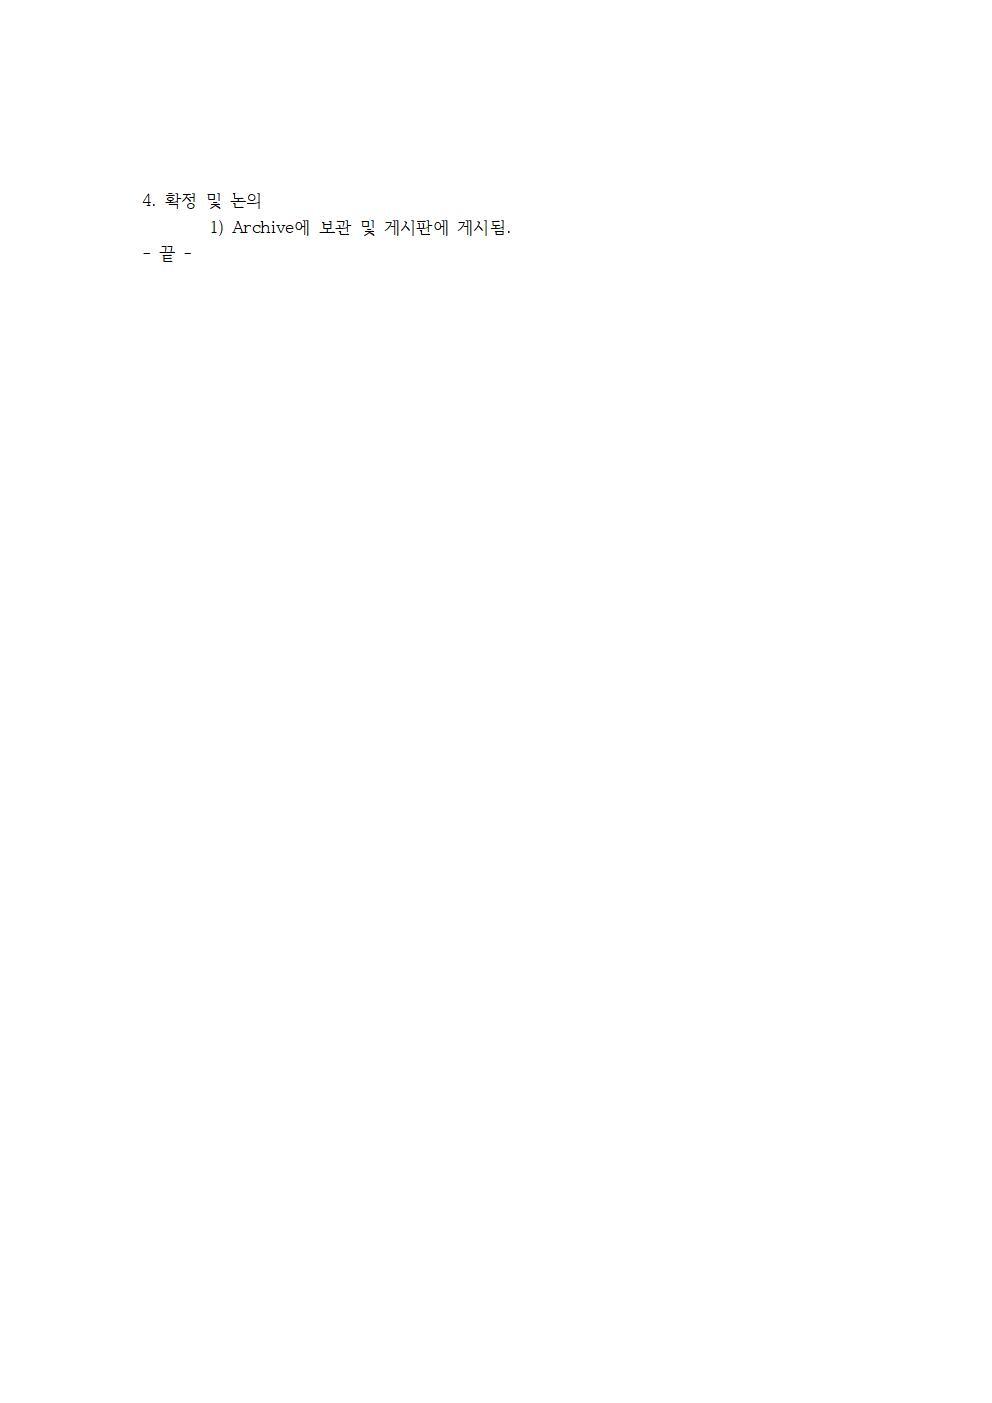 D-[17-005-RD-01]-[SAVE 2.0 ADOxx]-[YB]-[2017-11-09]002.jpg